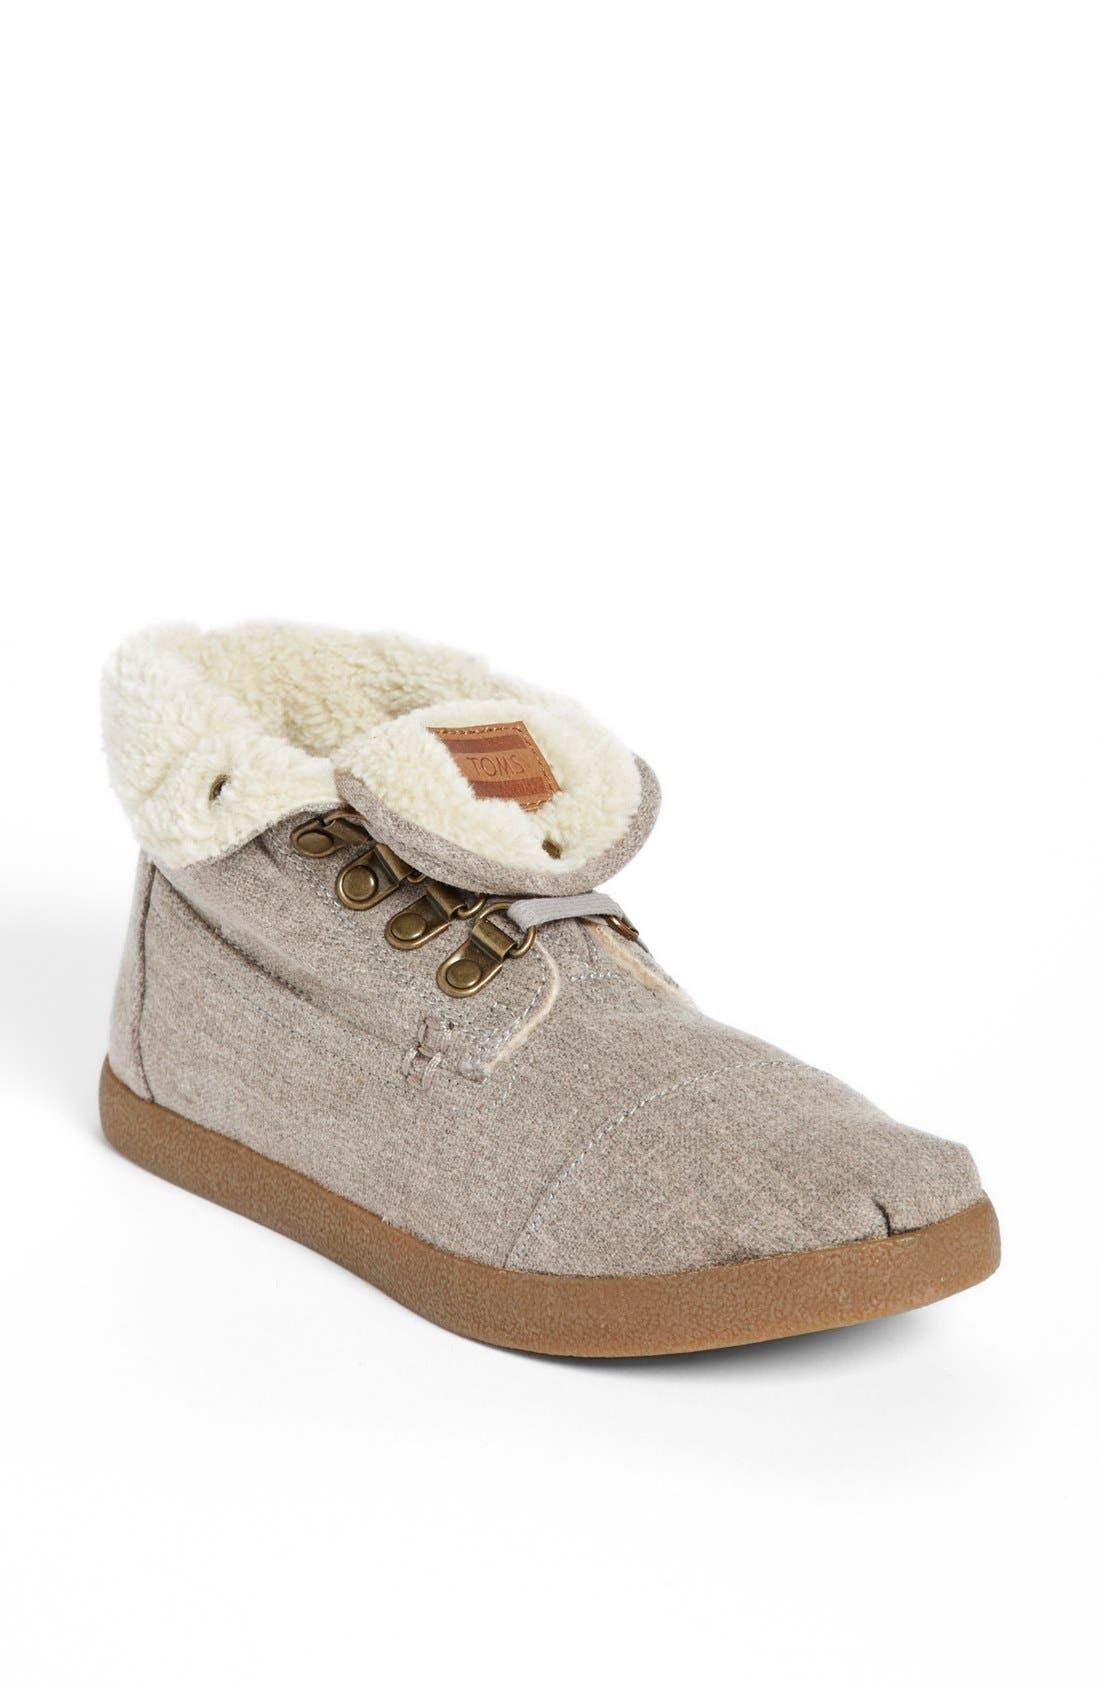 Main Image - TOMS 'High Botas' Fleece Boot (Women)